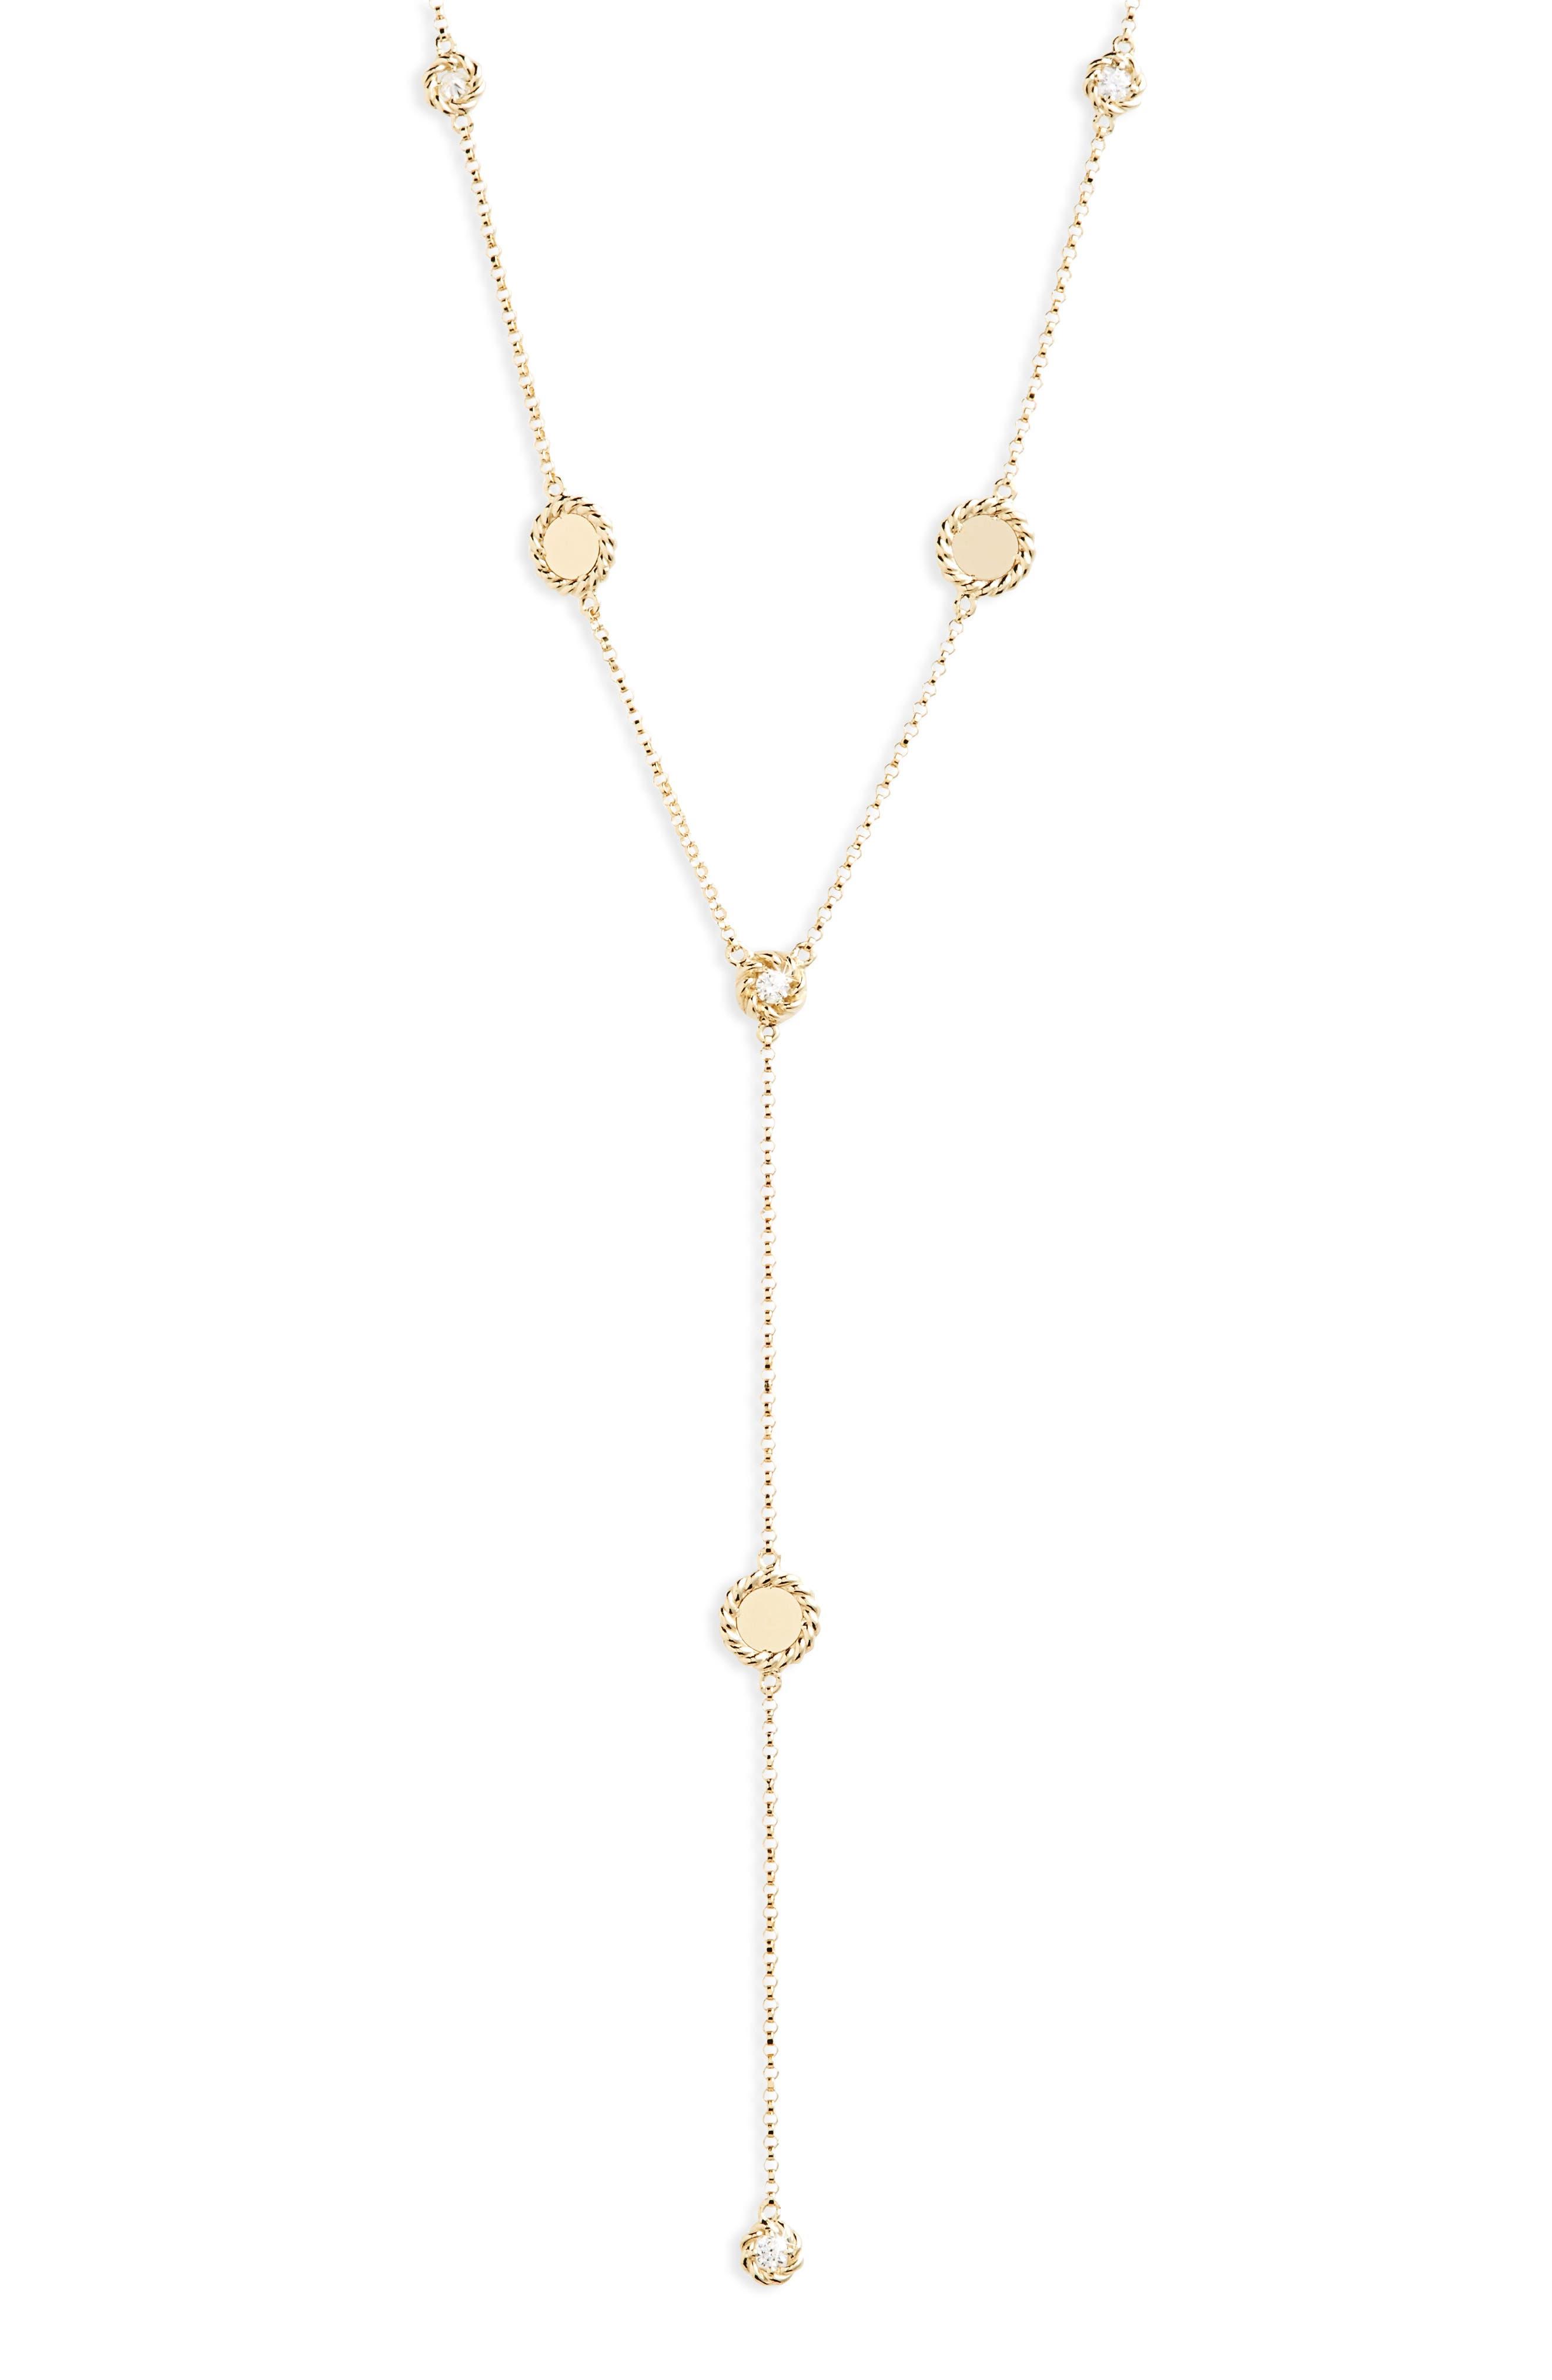 New Barocco Diamond Y-Necklace,                             Main thumbnail 1, color,                             D0.24 GHS1 18KYG